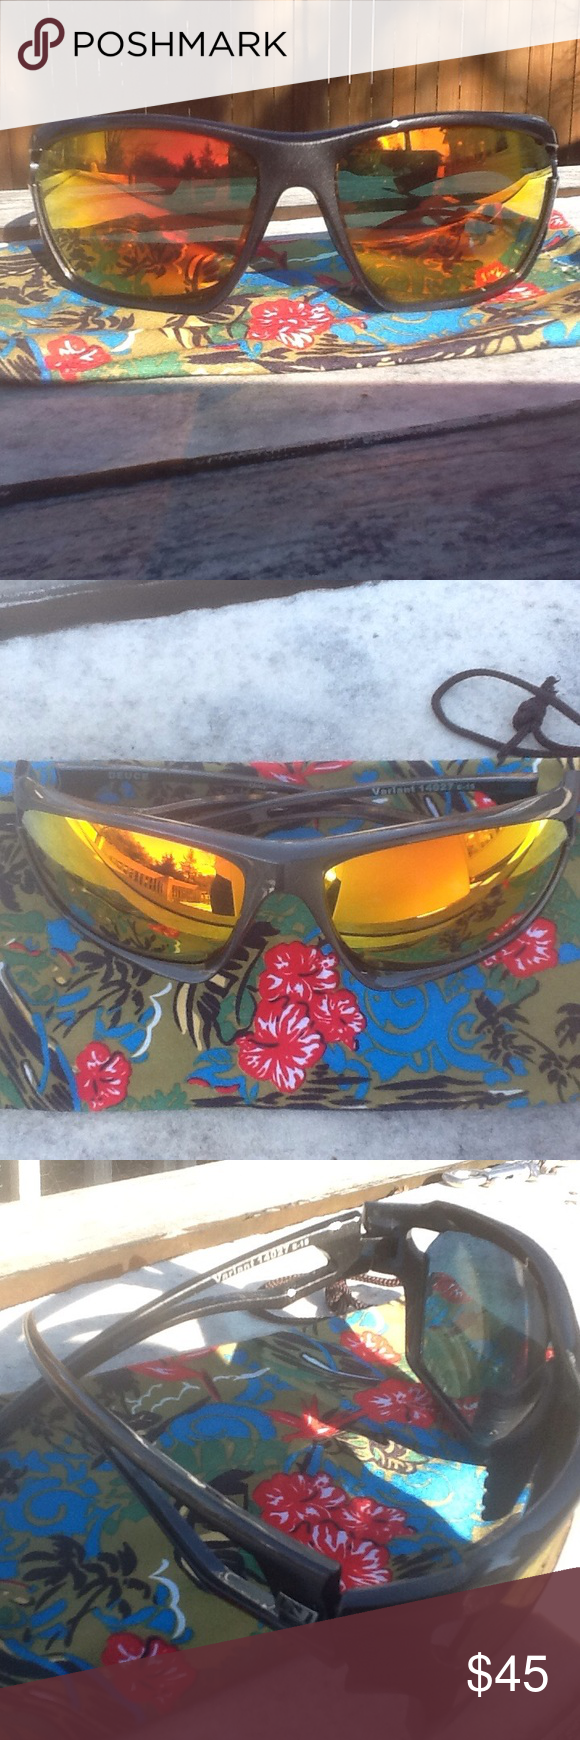 abb77791d0 Variant🕶Deuce Sunglasses NWOT 💯% UV Protection